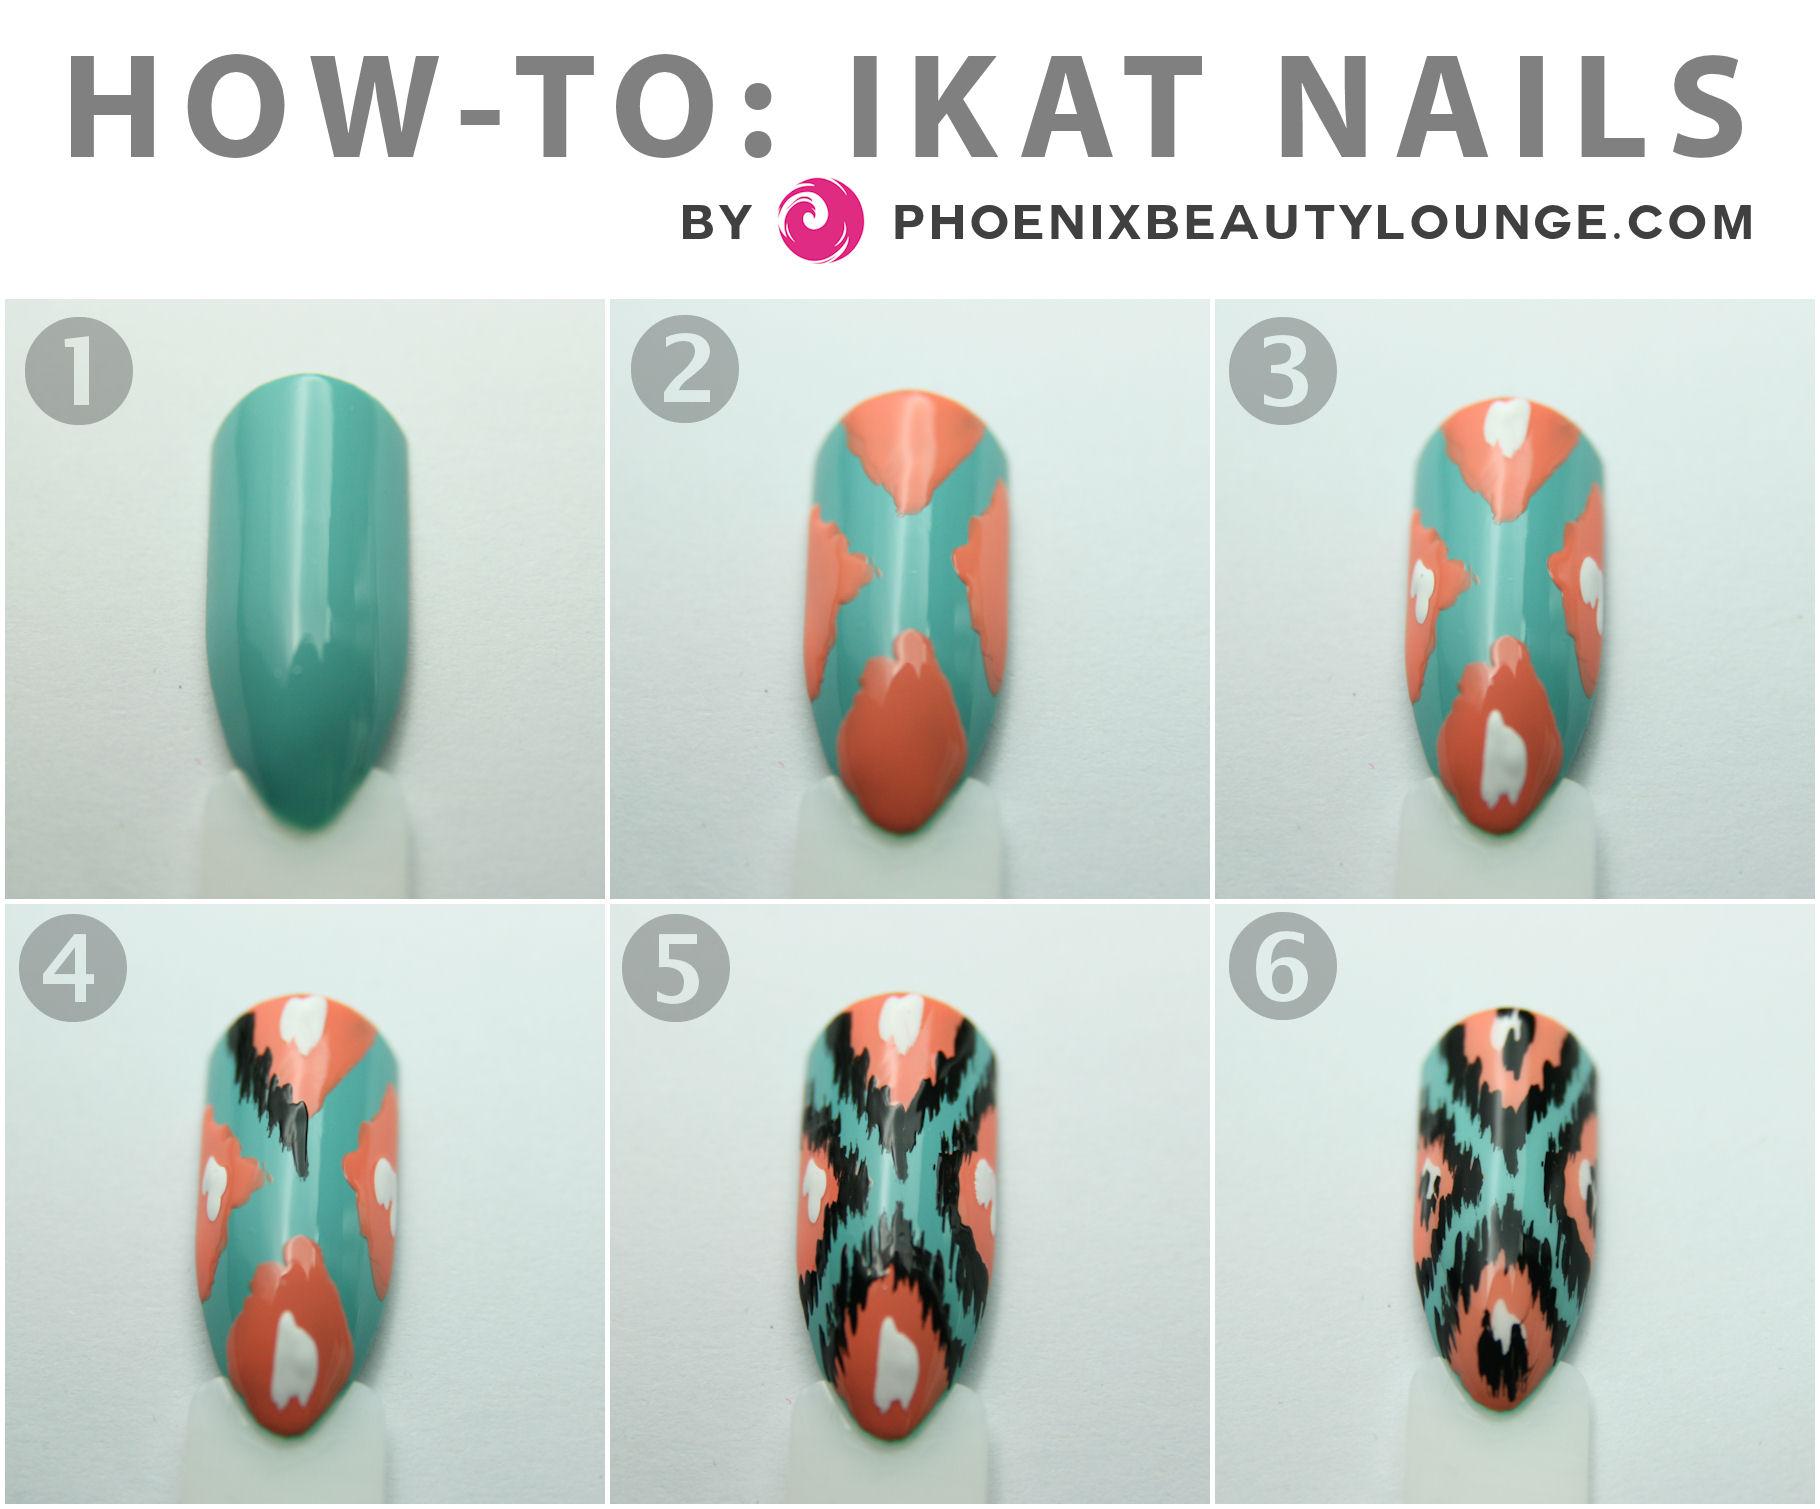 Nail Art Tutorial: Ikat Nails | Phoenix Beauty Lounge